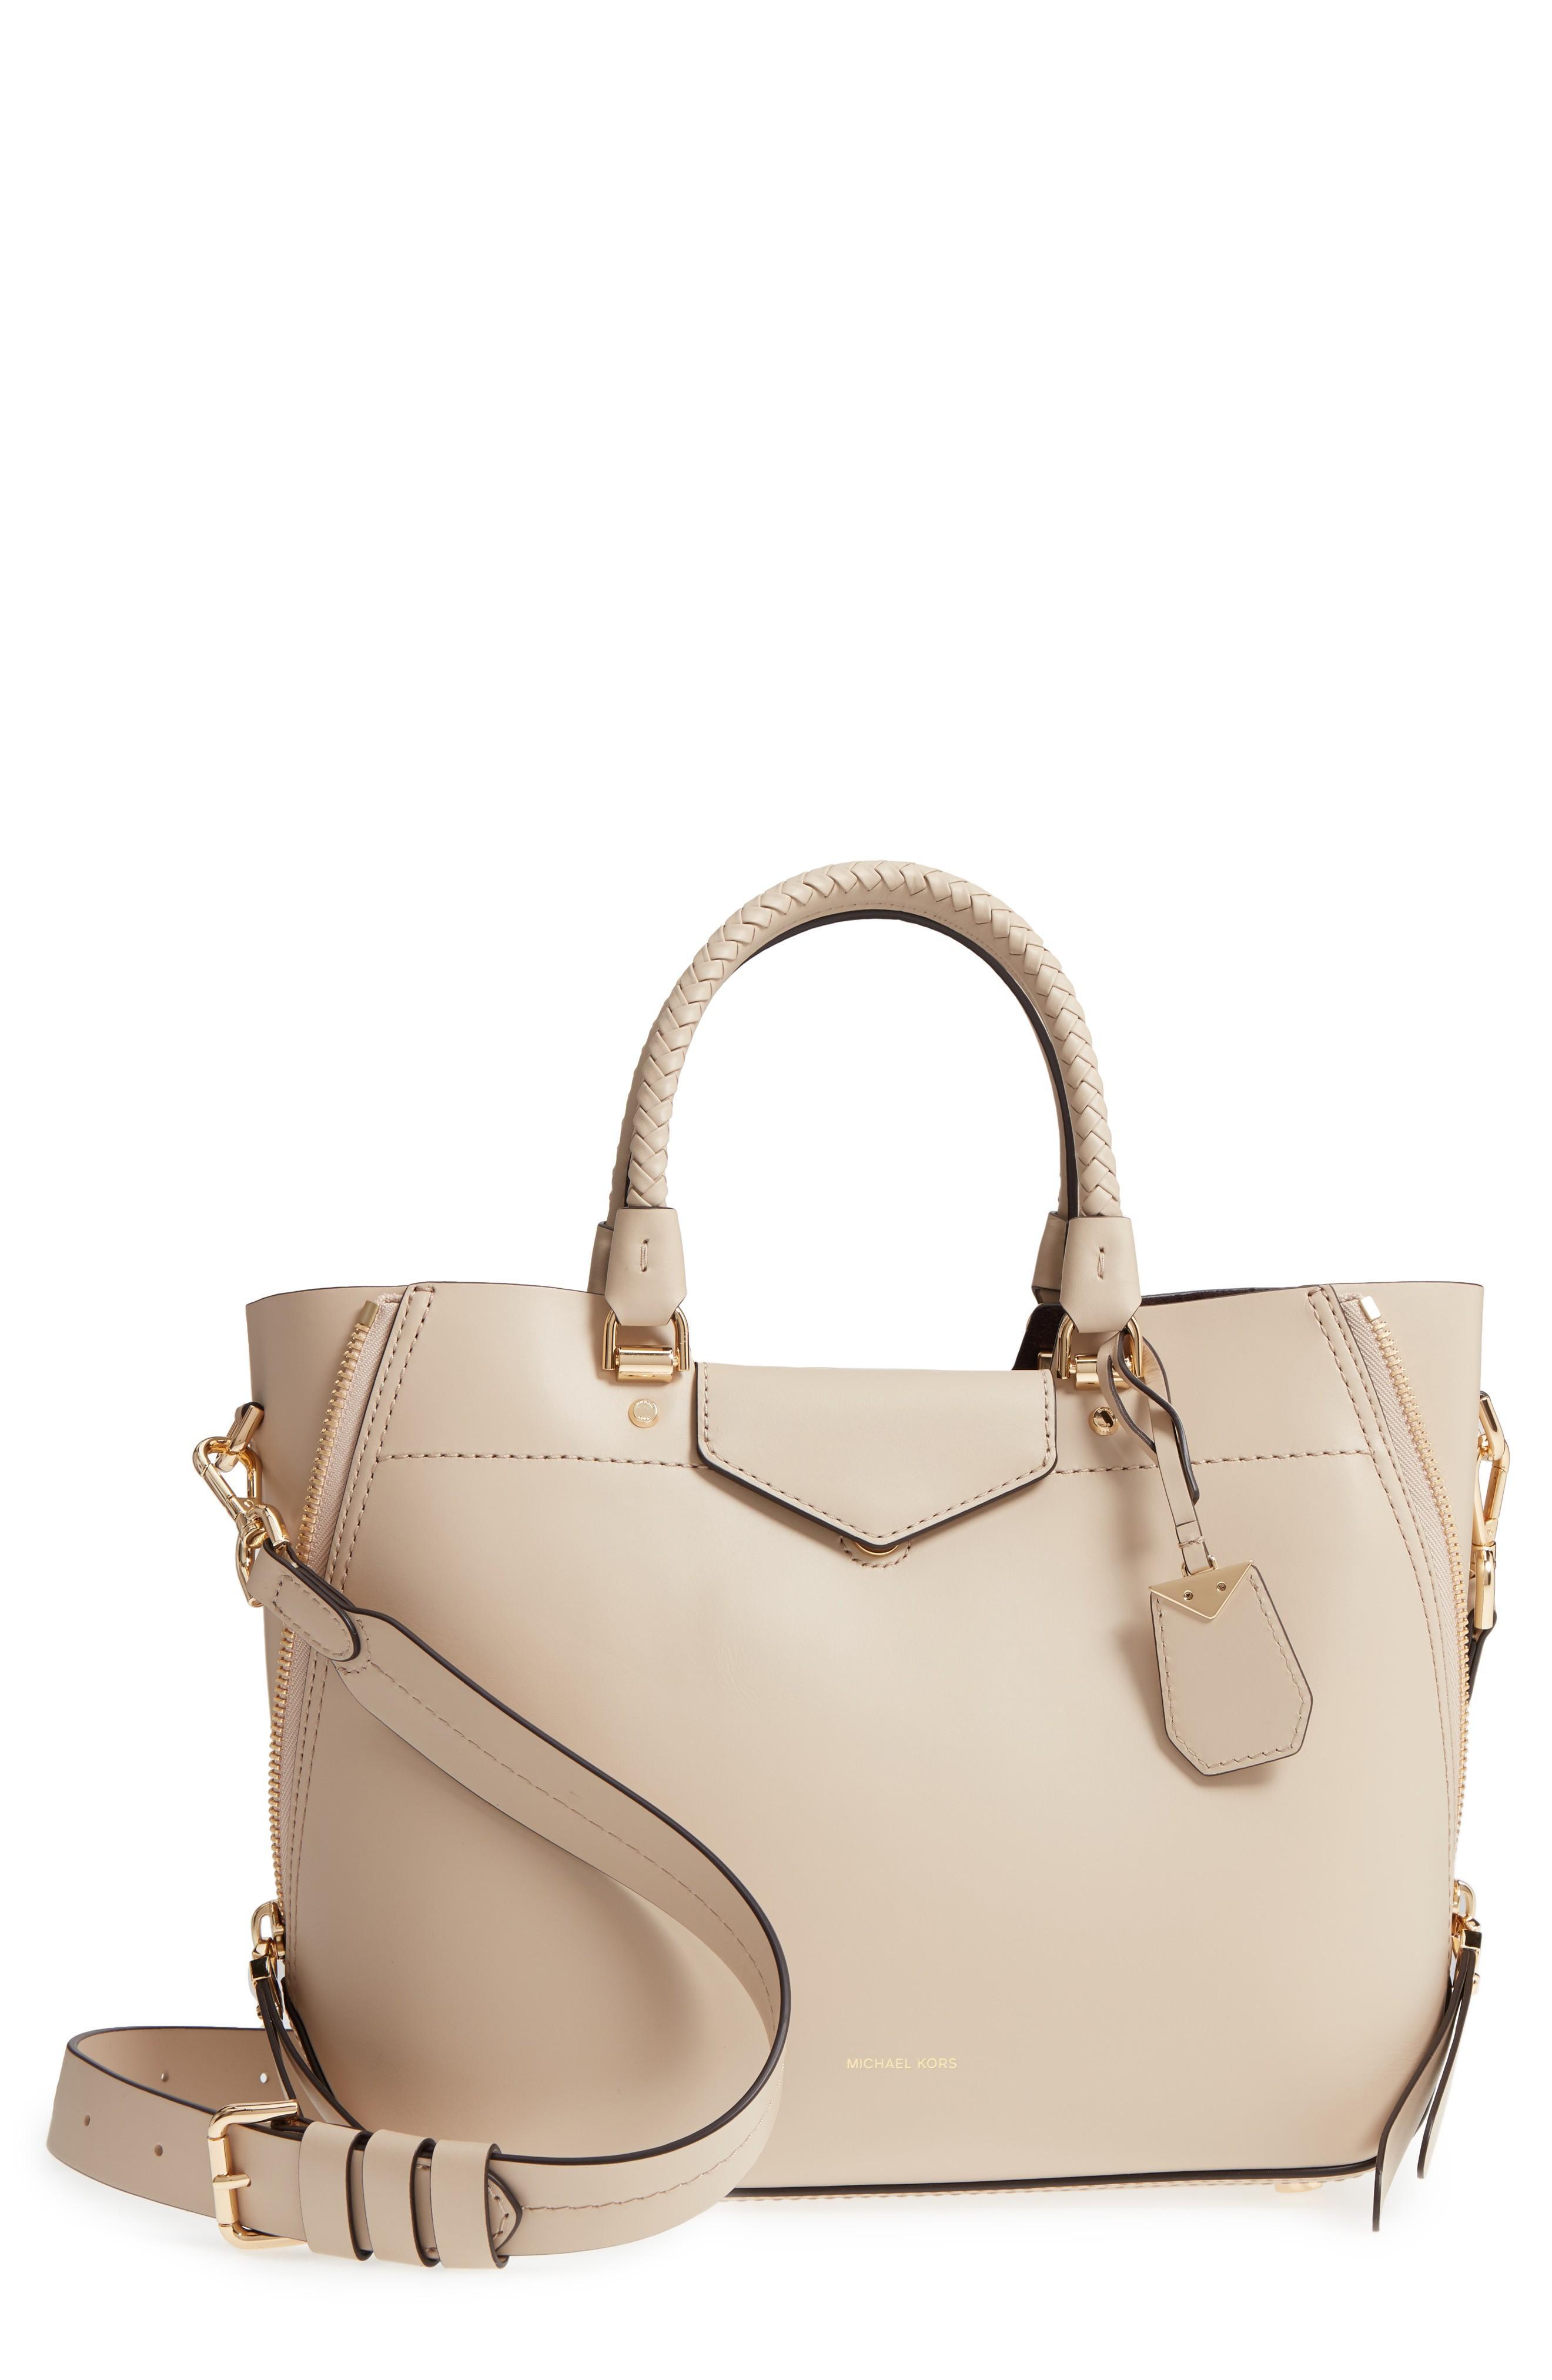 a00c79e39df1 Michael Michael Kors Blakely Medium Leather Tote Bag In Beige | ModeSens